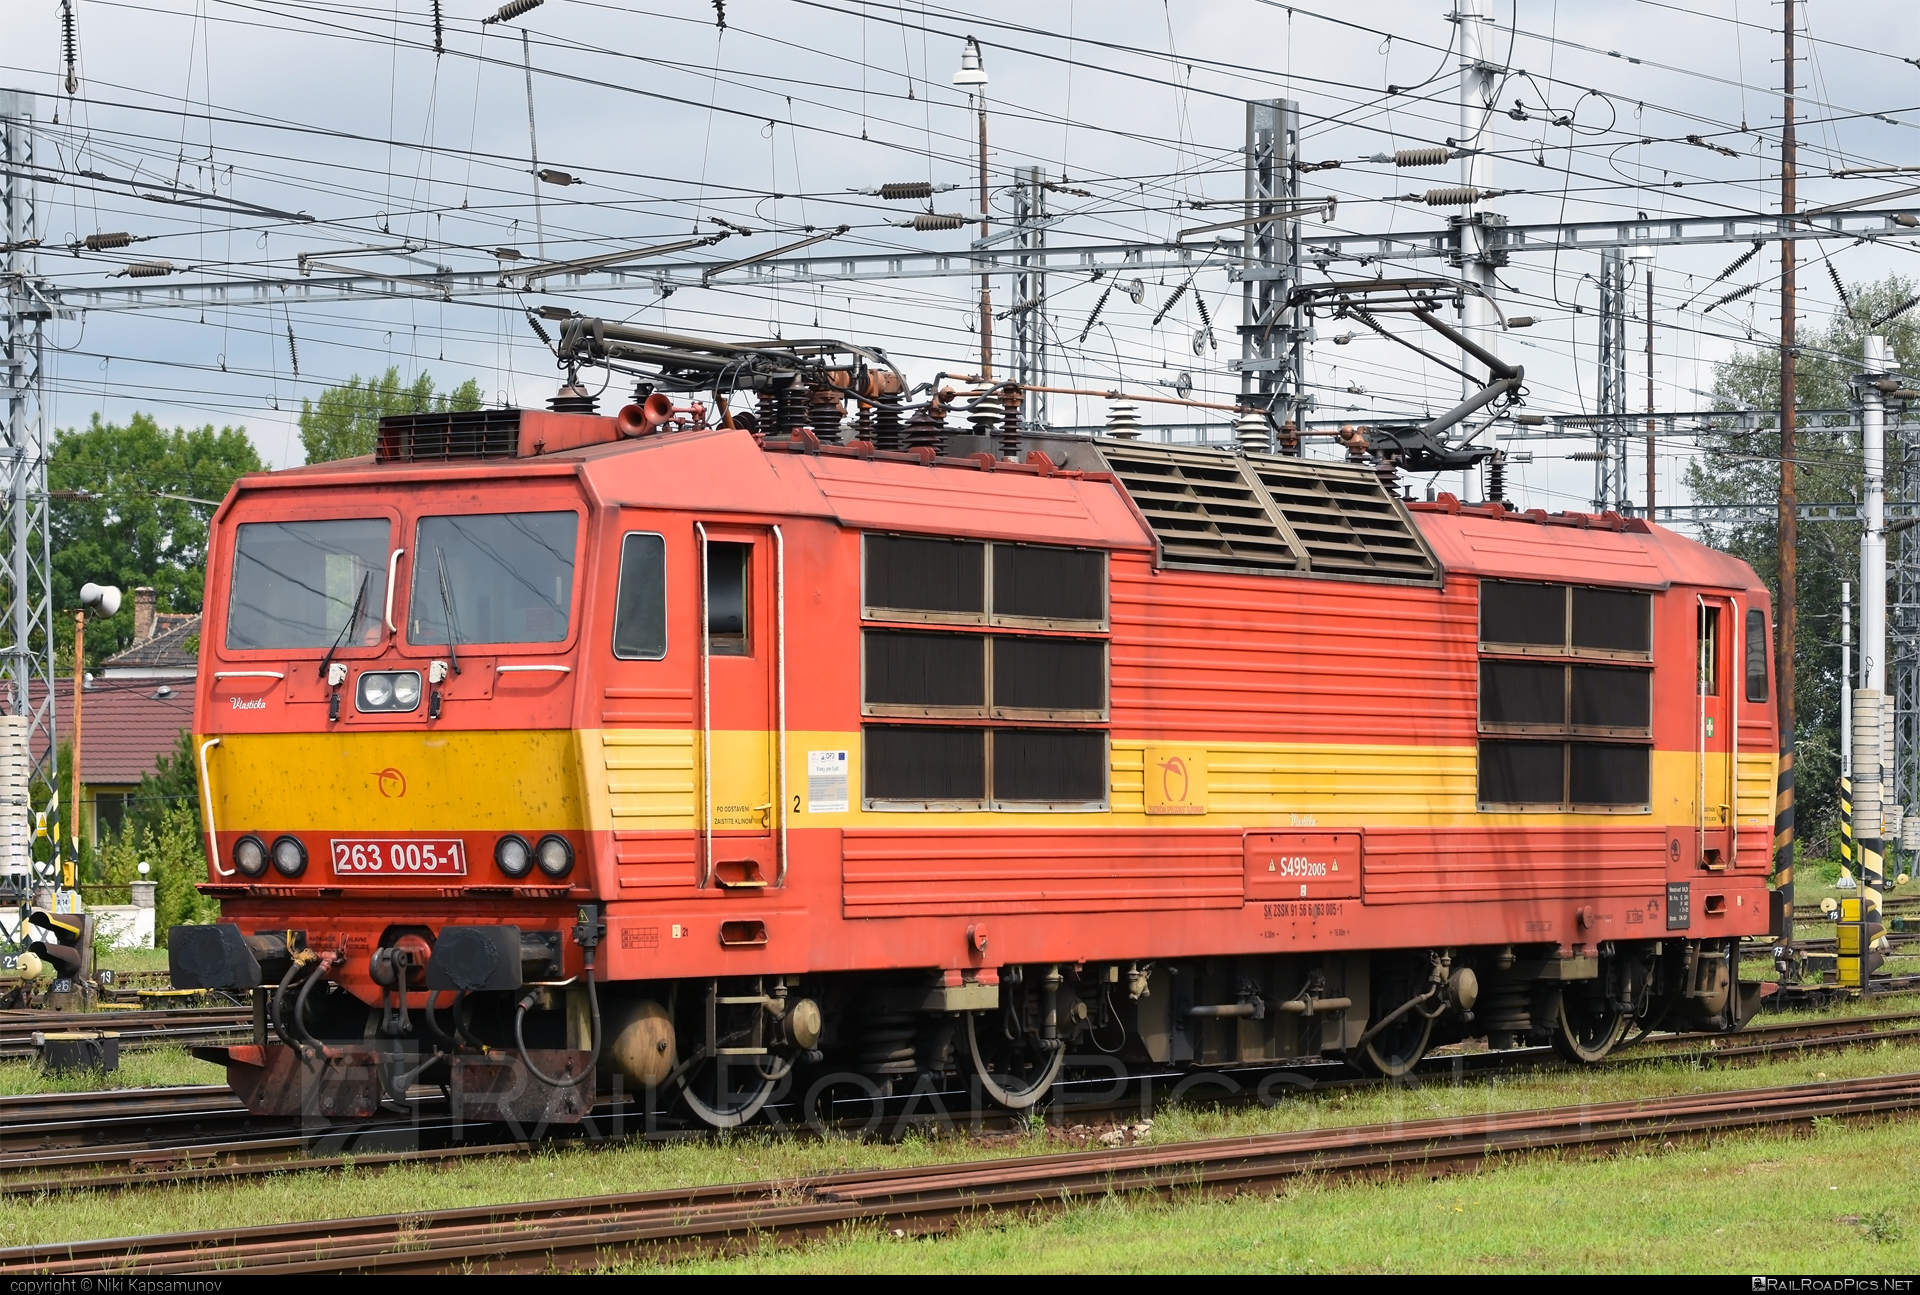 Škoda 70E - 263 005-1 operated by Železničná Spoločnost' Slovensko, a.s. #ZeleznicnaSpolocnostSlovensko #locomotive263 #princezna #skoda #skoda70e #zssk